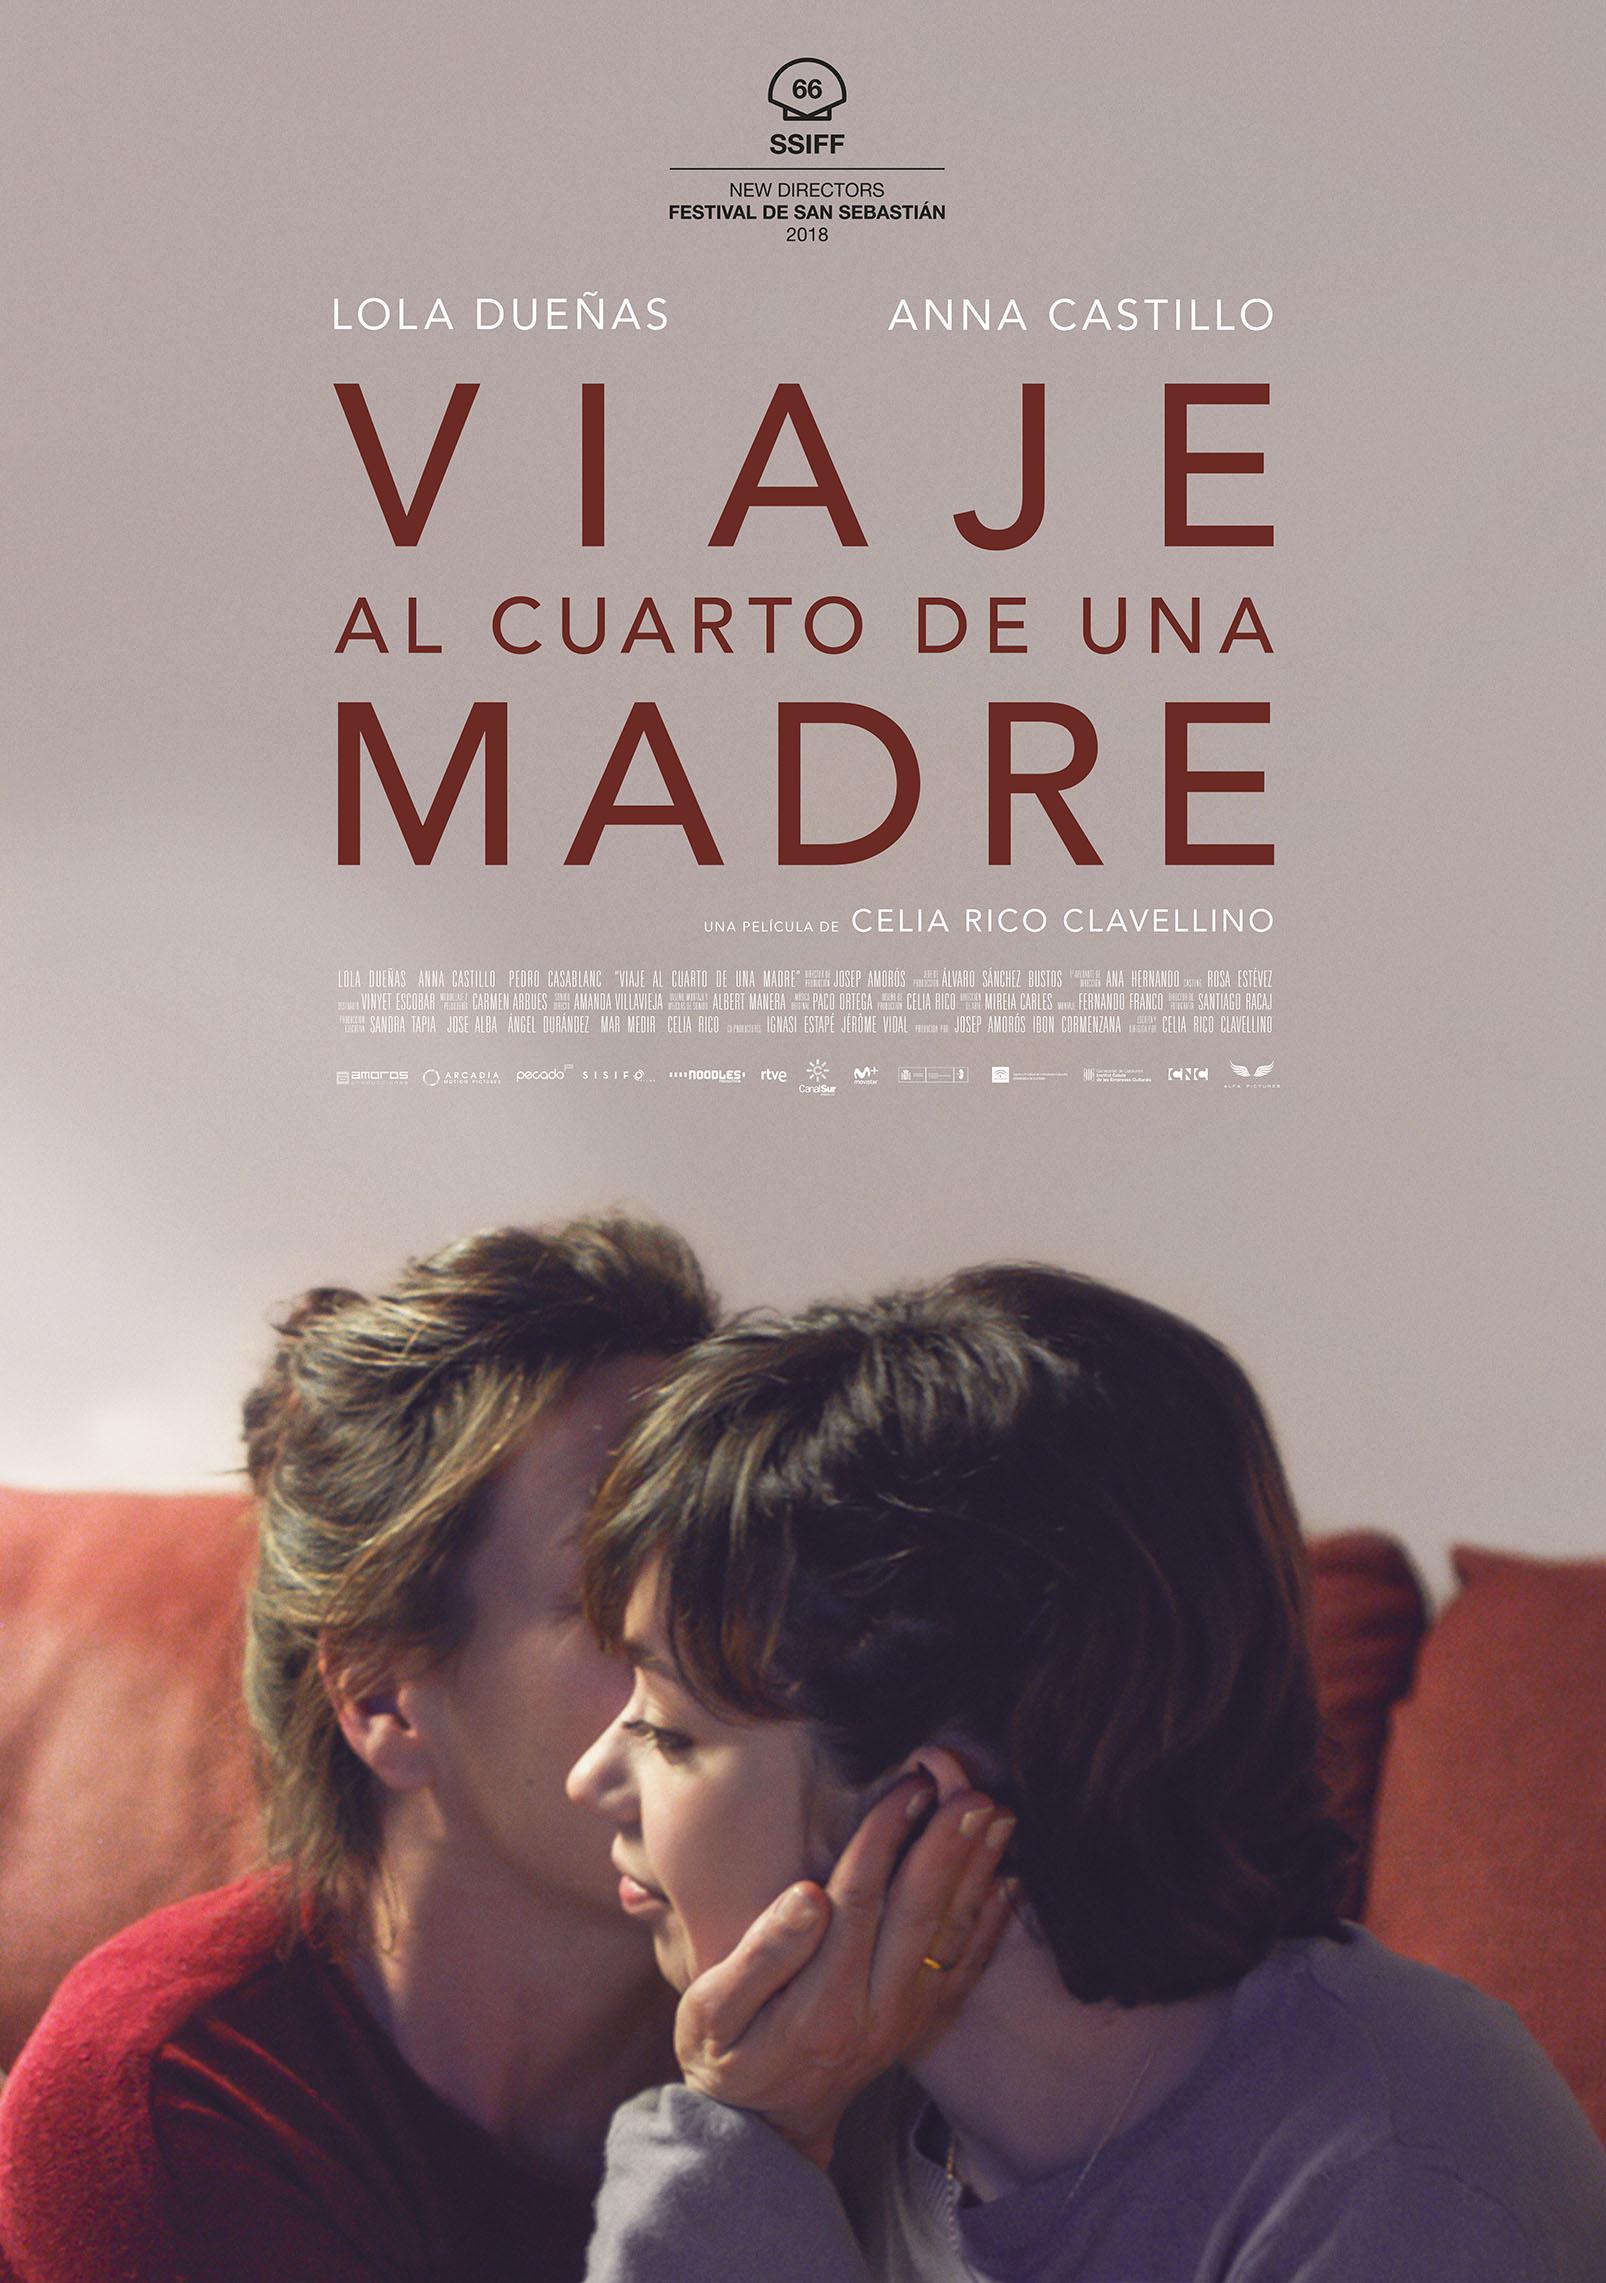 festival de cine alicante viaje cuarto madre